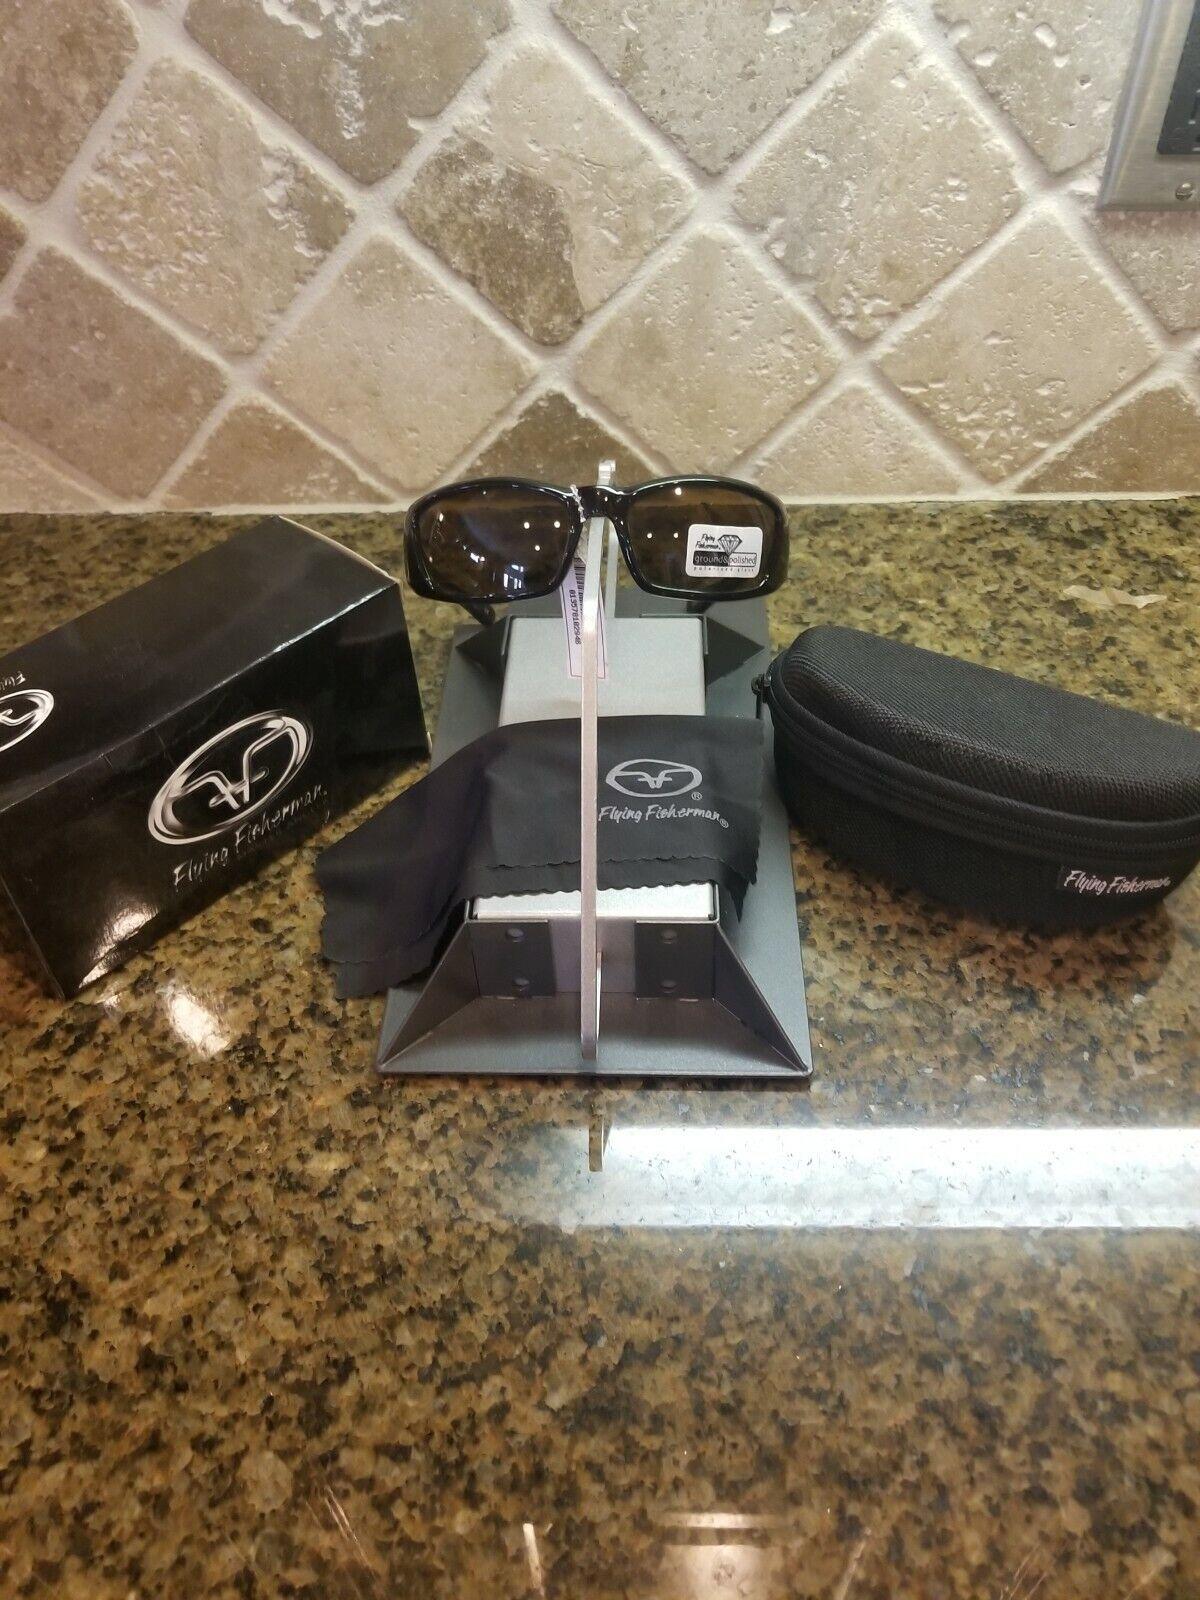 Flying fisherman polarized sunglasses  BOCA  Tortoise  frames- amber lenses  stadium giveaways